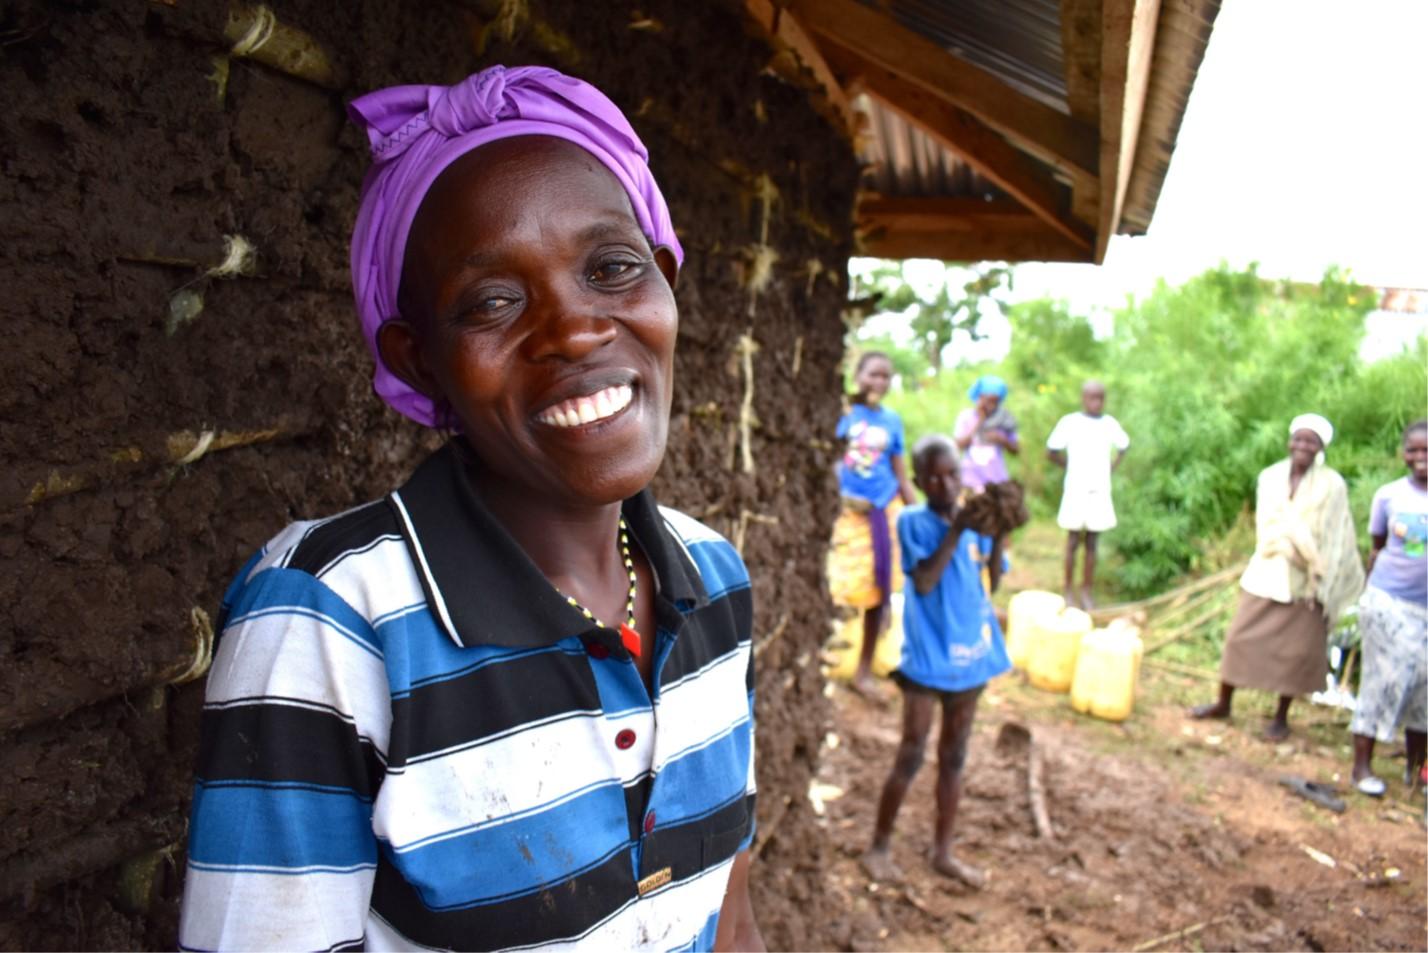 Join us in Rebuilding Women's Houses & Lives in Kenya